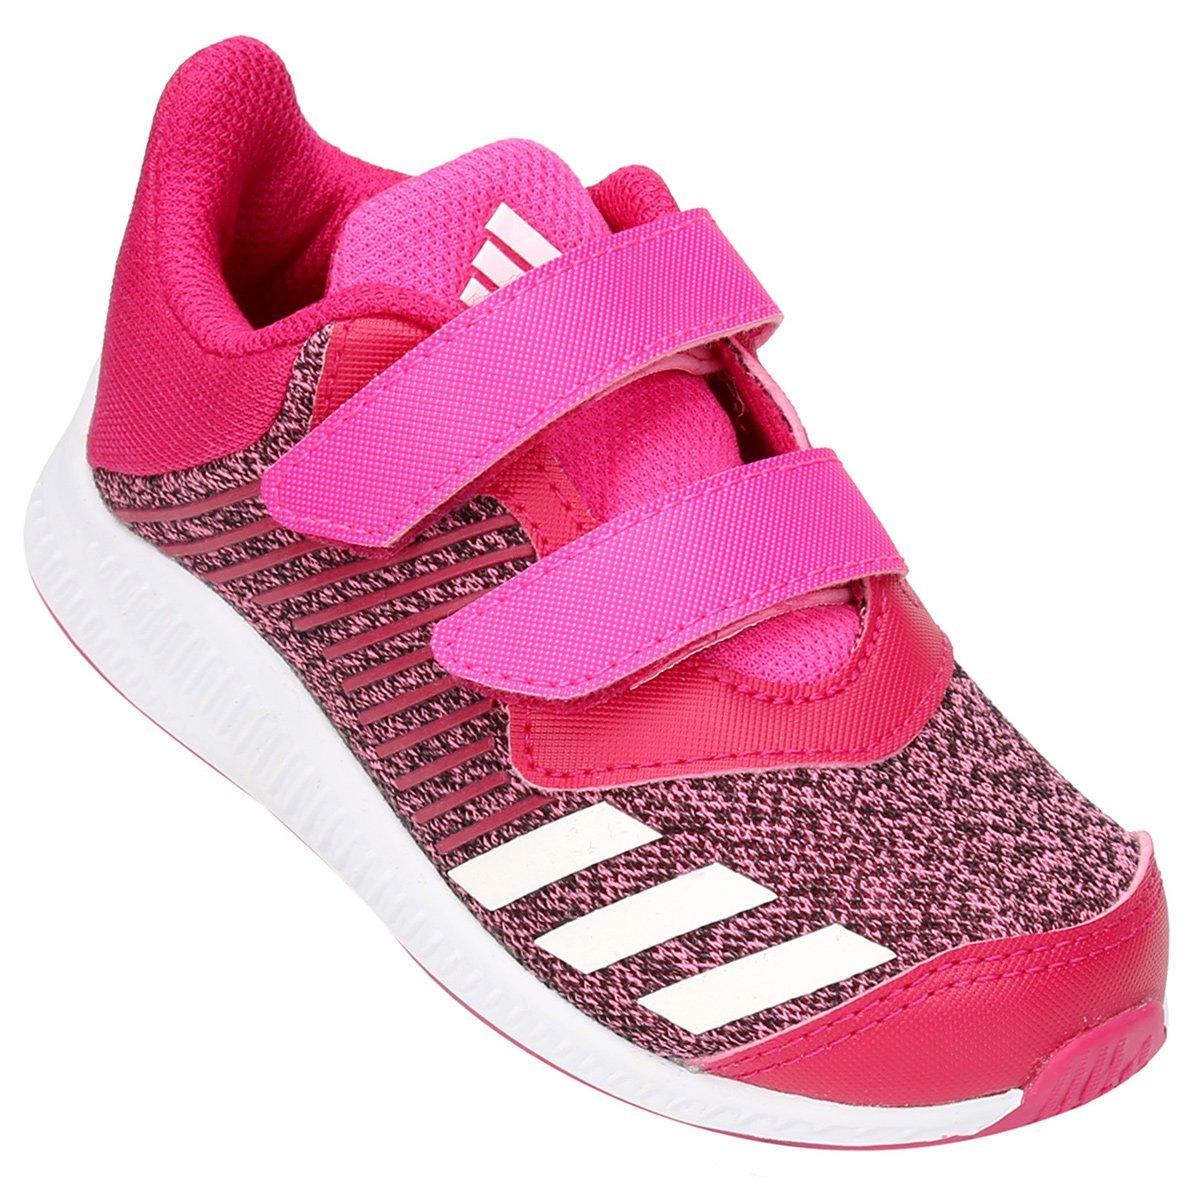 58daa533e Tênis Infantil Adidas Fortarun Cf I - Pink - Compre Agora